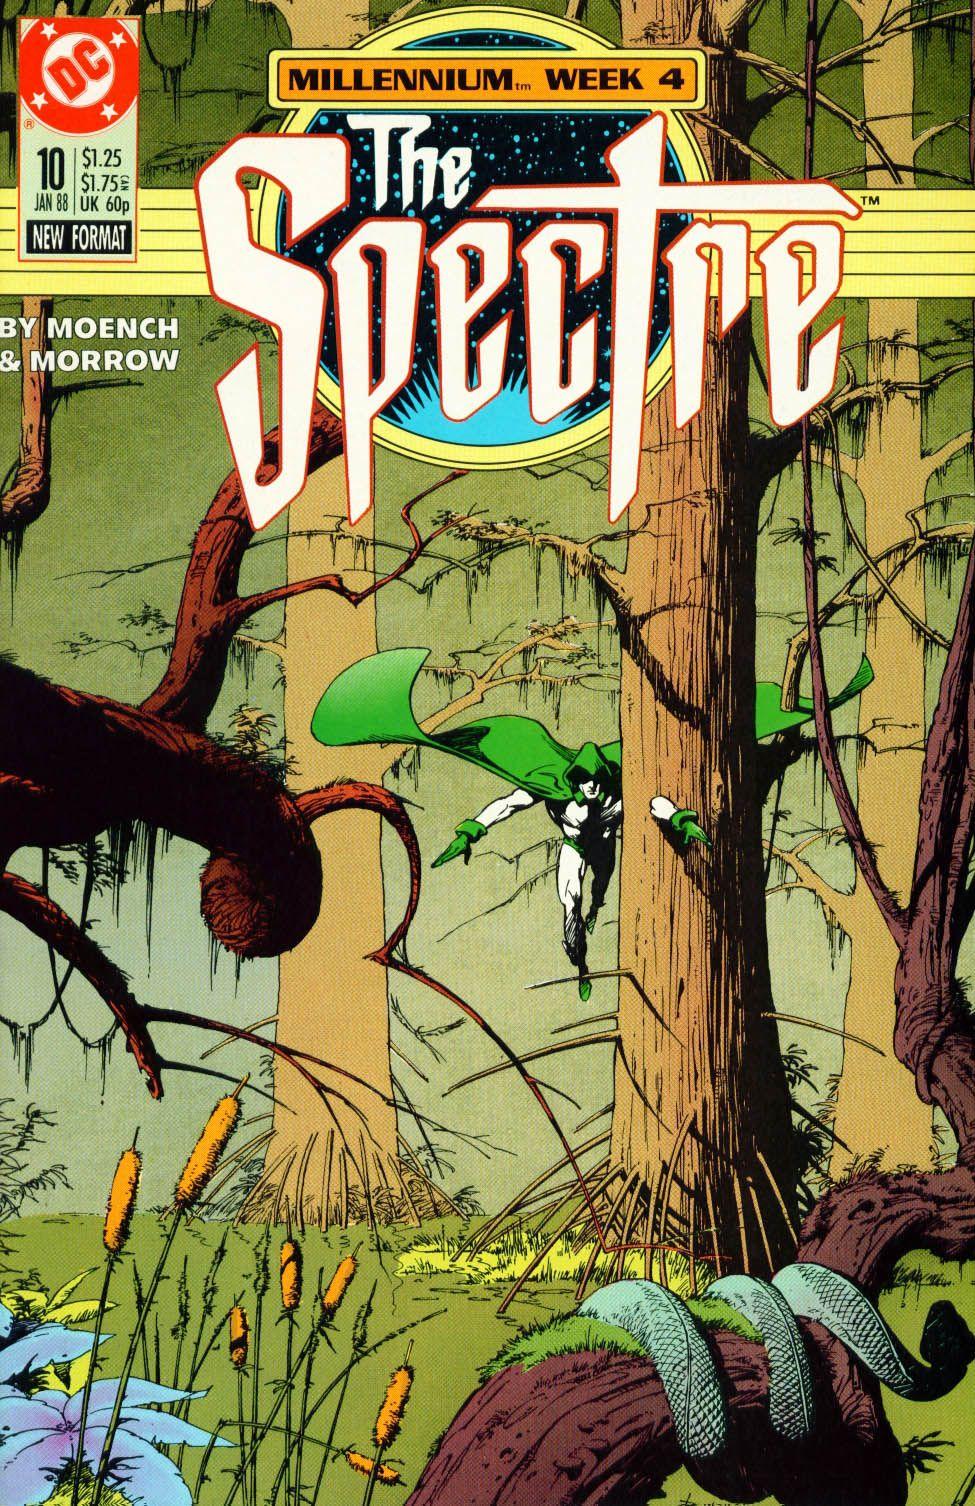 The Spectre #10 (DC Comics